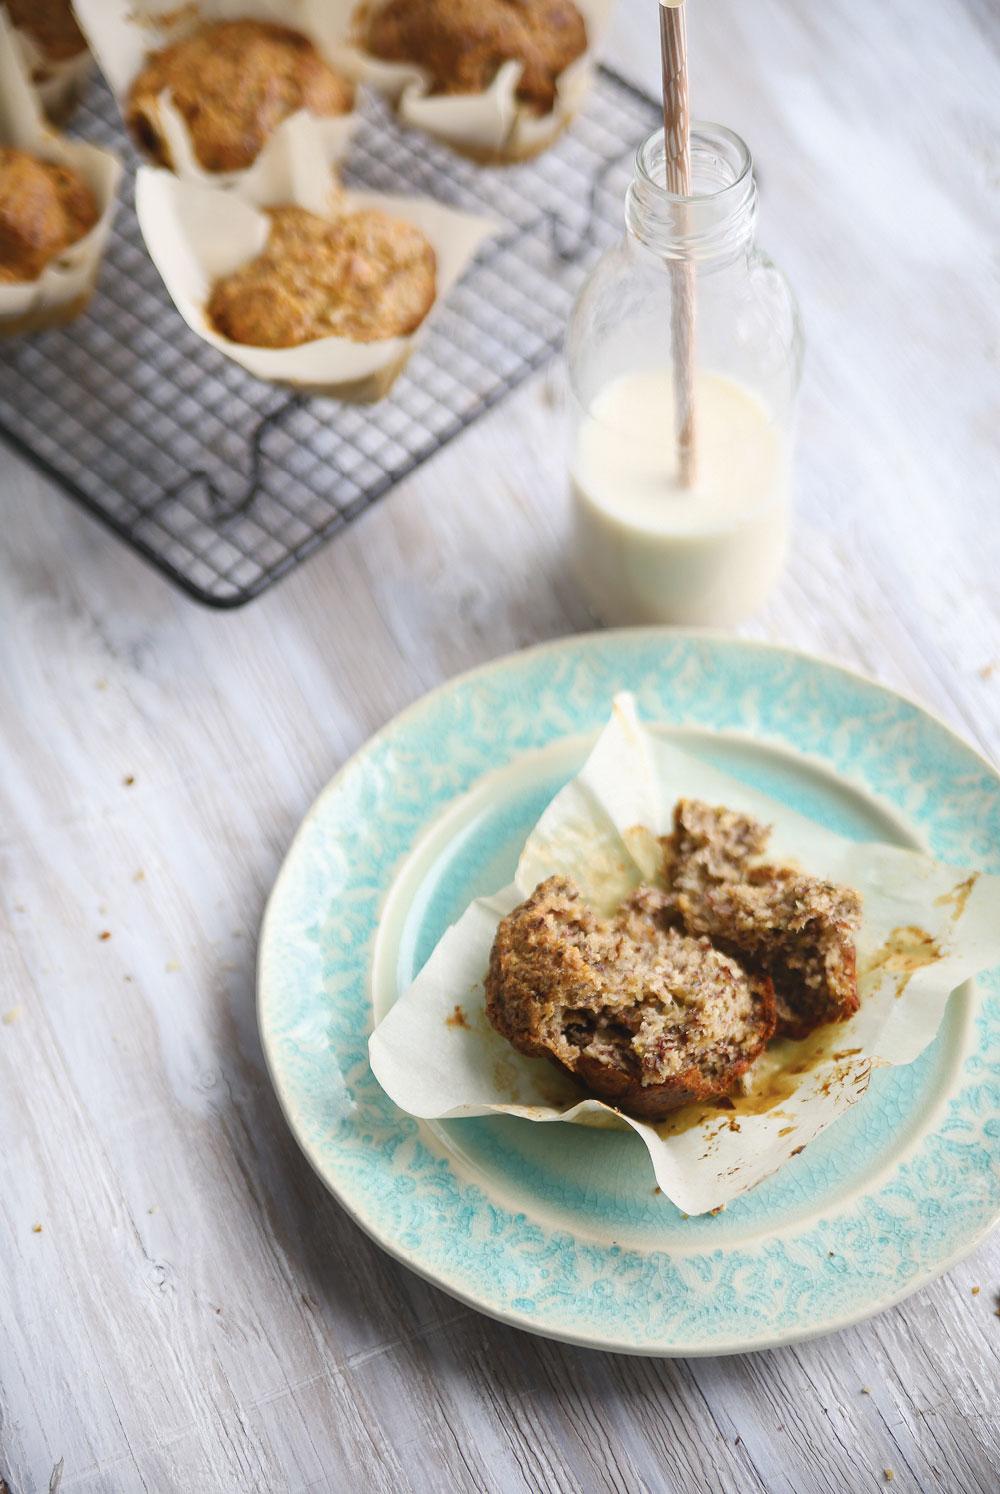 Pure-Ella-Hemp-seed-Banana-Bread-Muffins4